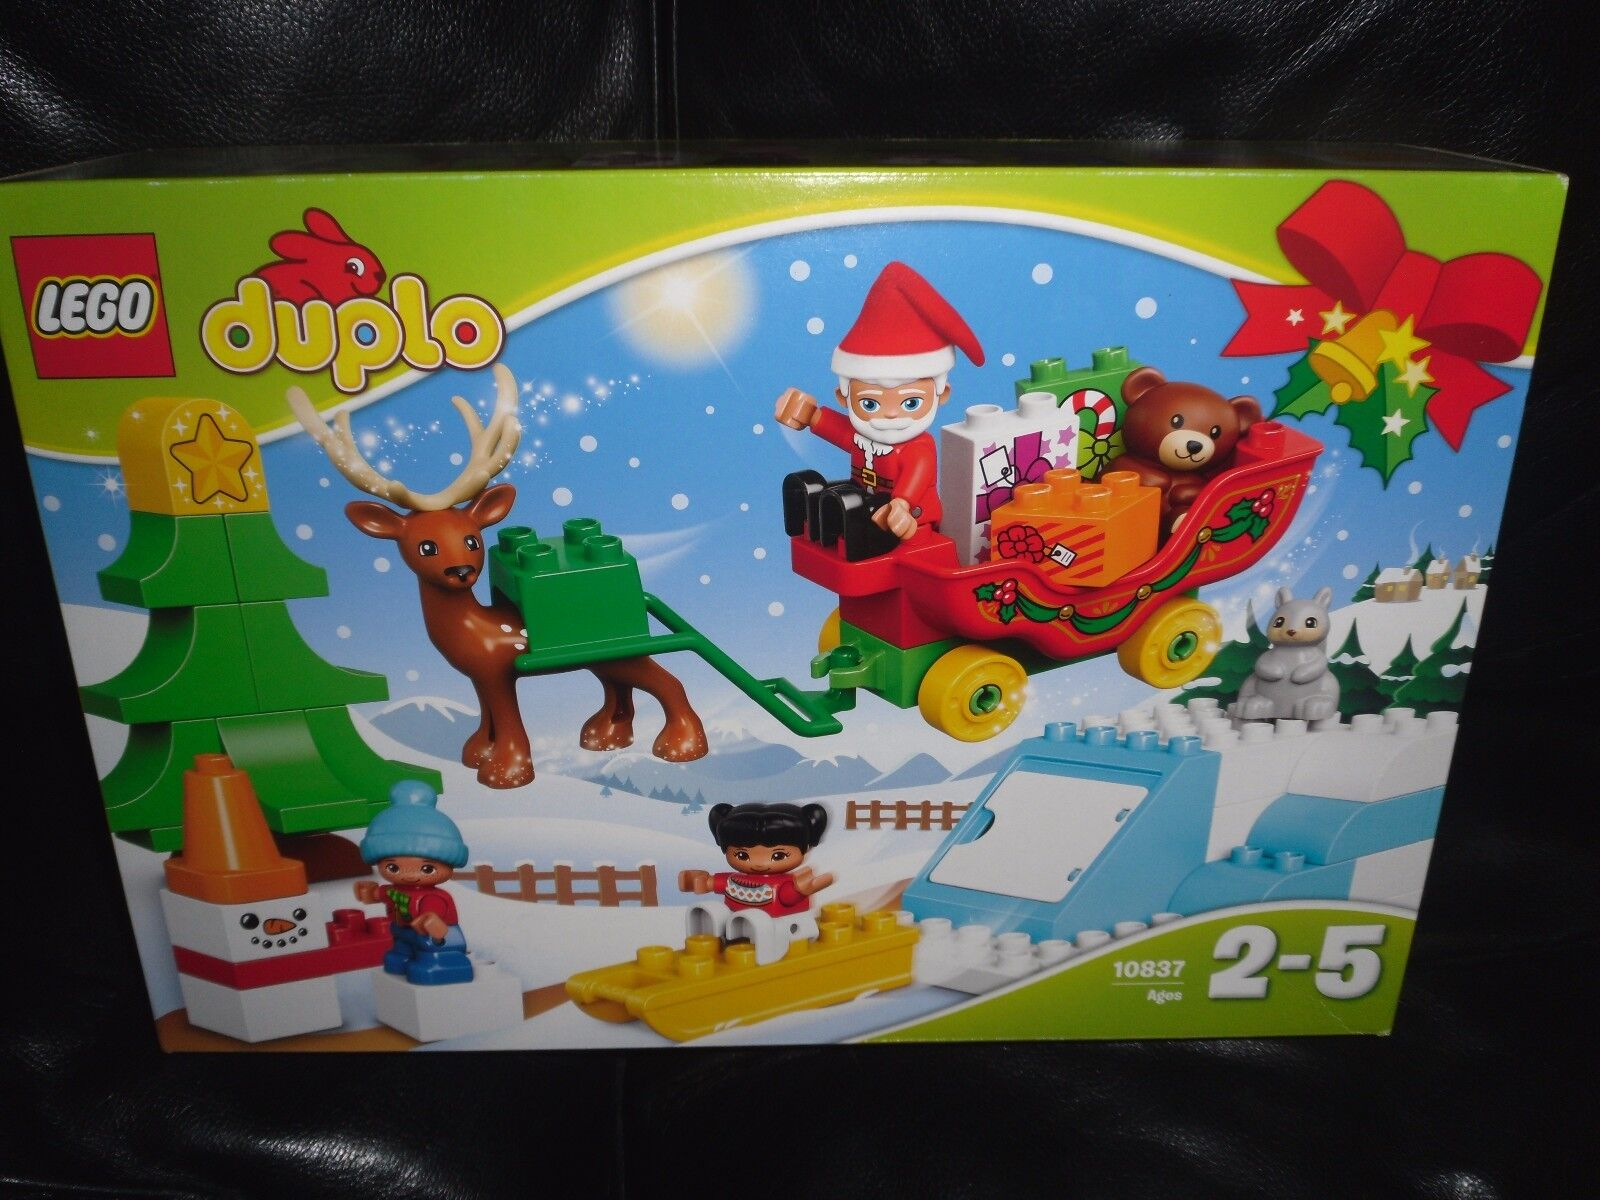 Lego Duplo 10837 SANTA'S WINTER HOLIDAY, ages 2-5yrs BRAND NEW & STILL SEALED